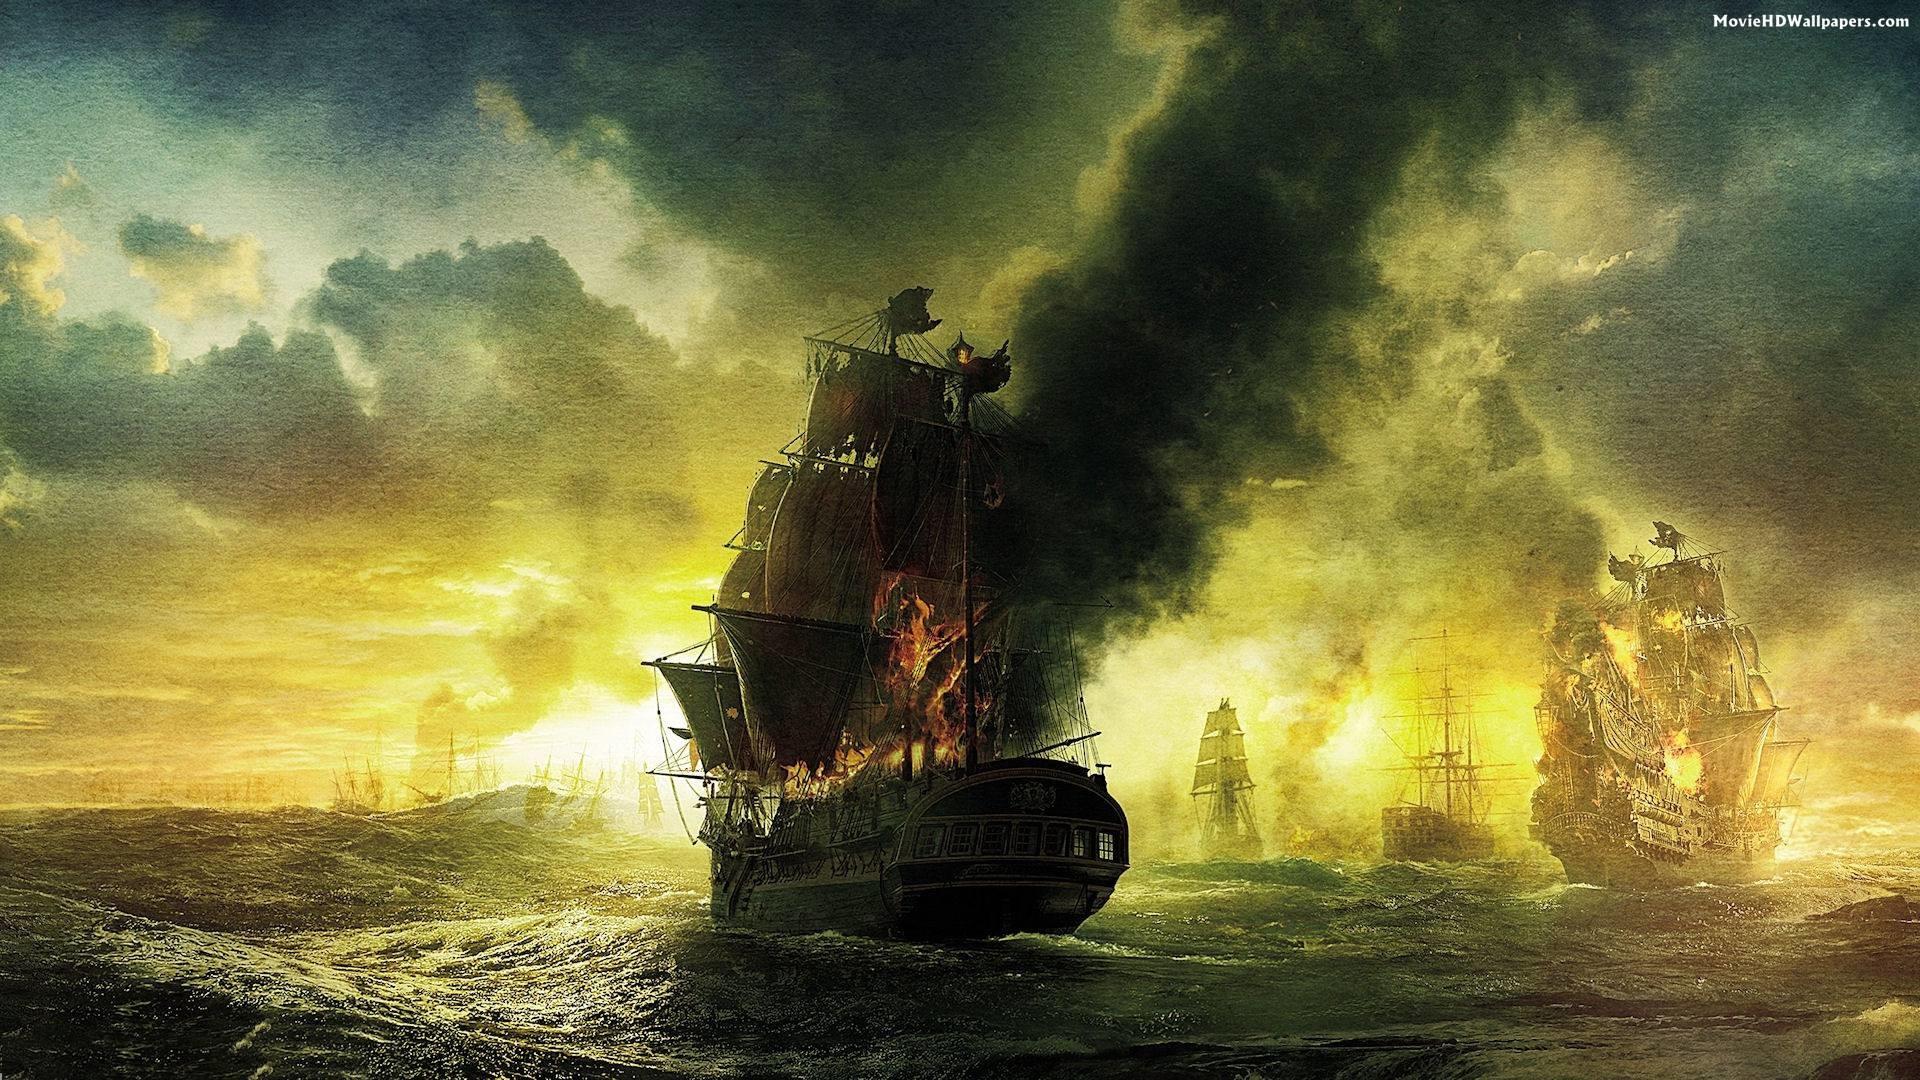 Pirates of the Caribbean On Stranger Tides Ship